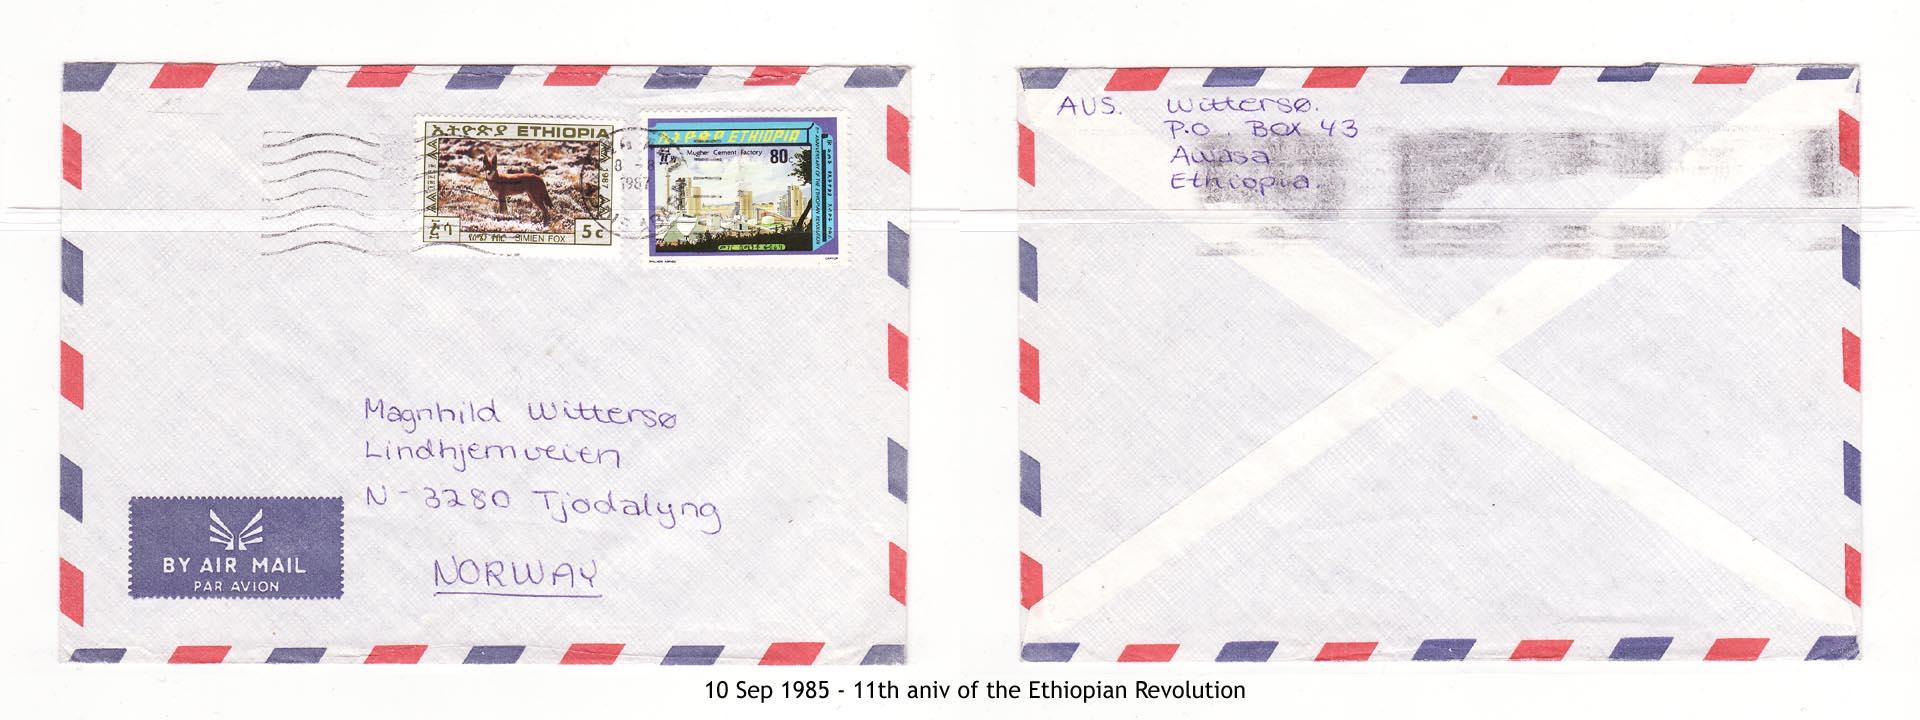 19850910 - 11th aniv of the Ethiopian Revolution